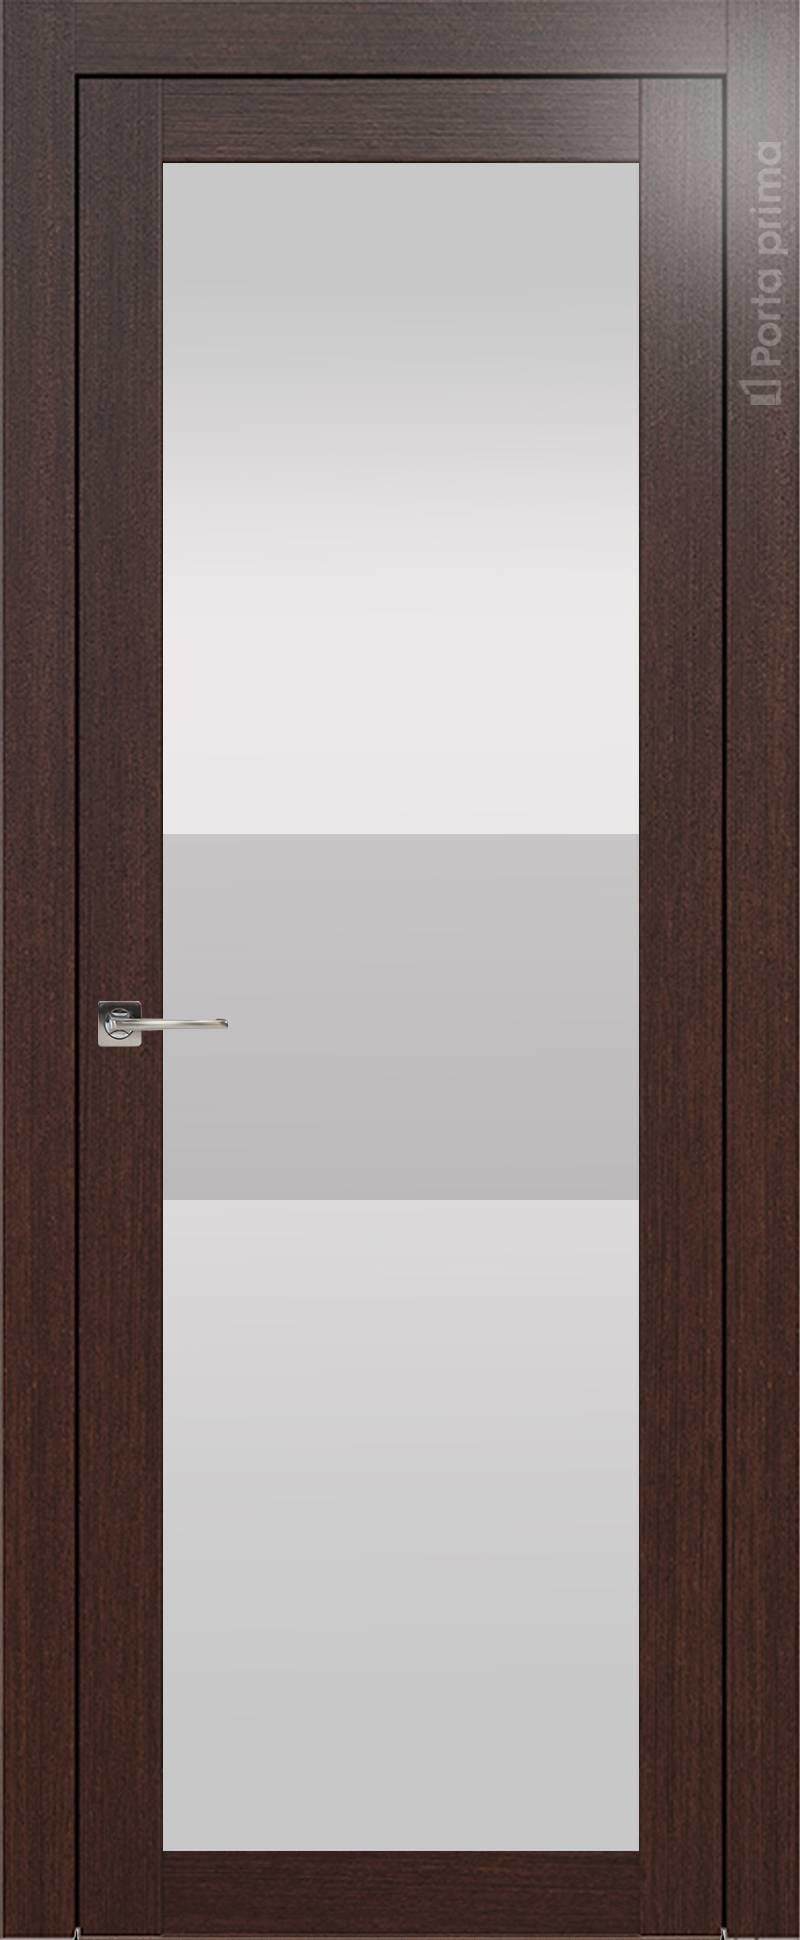 Tivoli З-4 цвет - Венге Со стеклом (ДО)